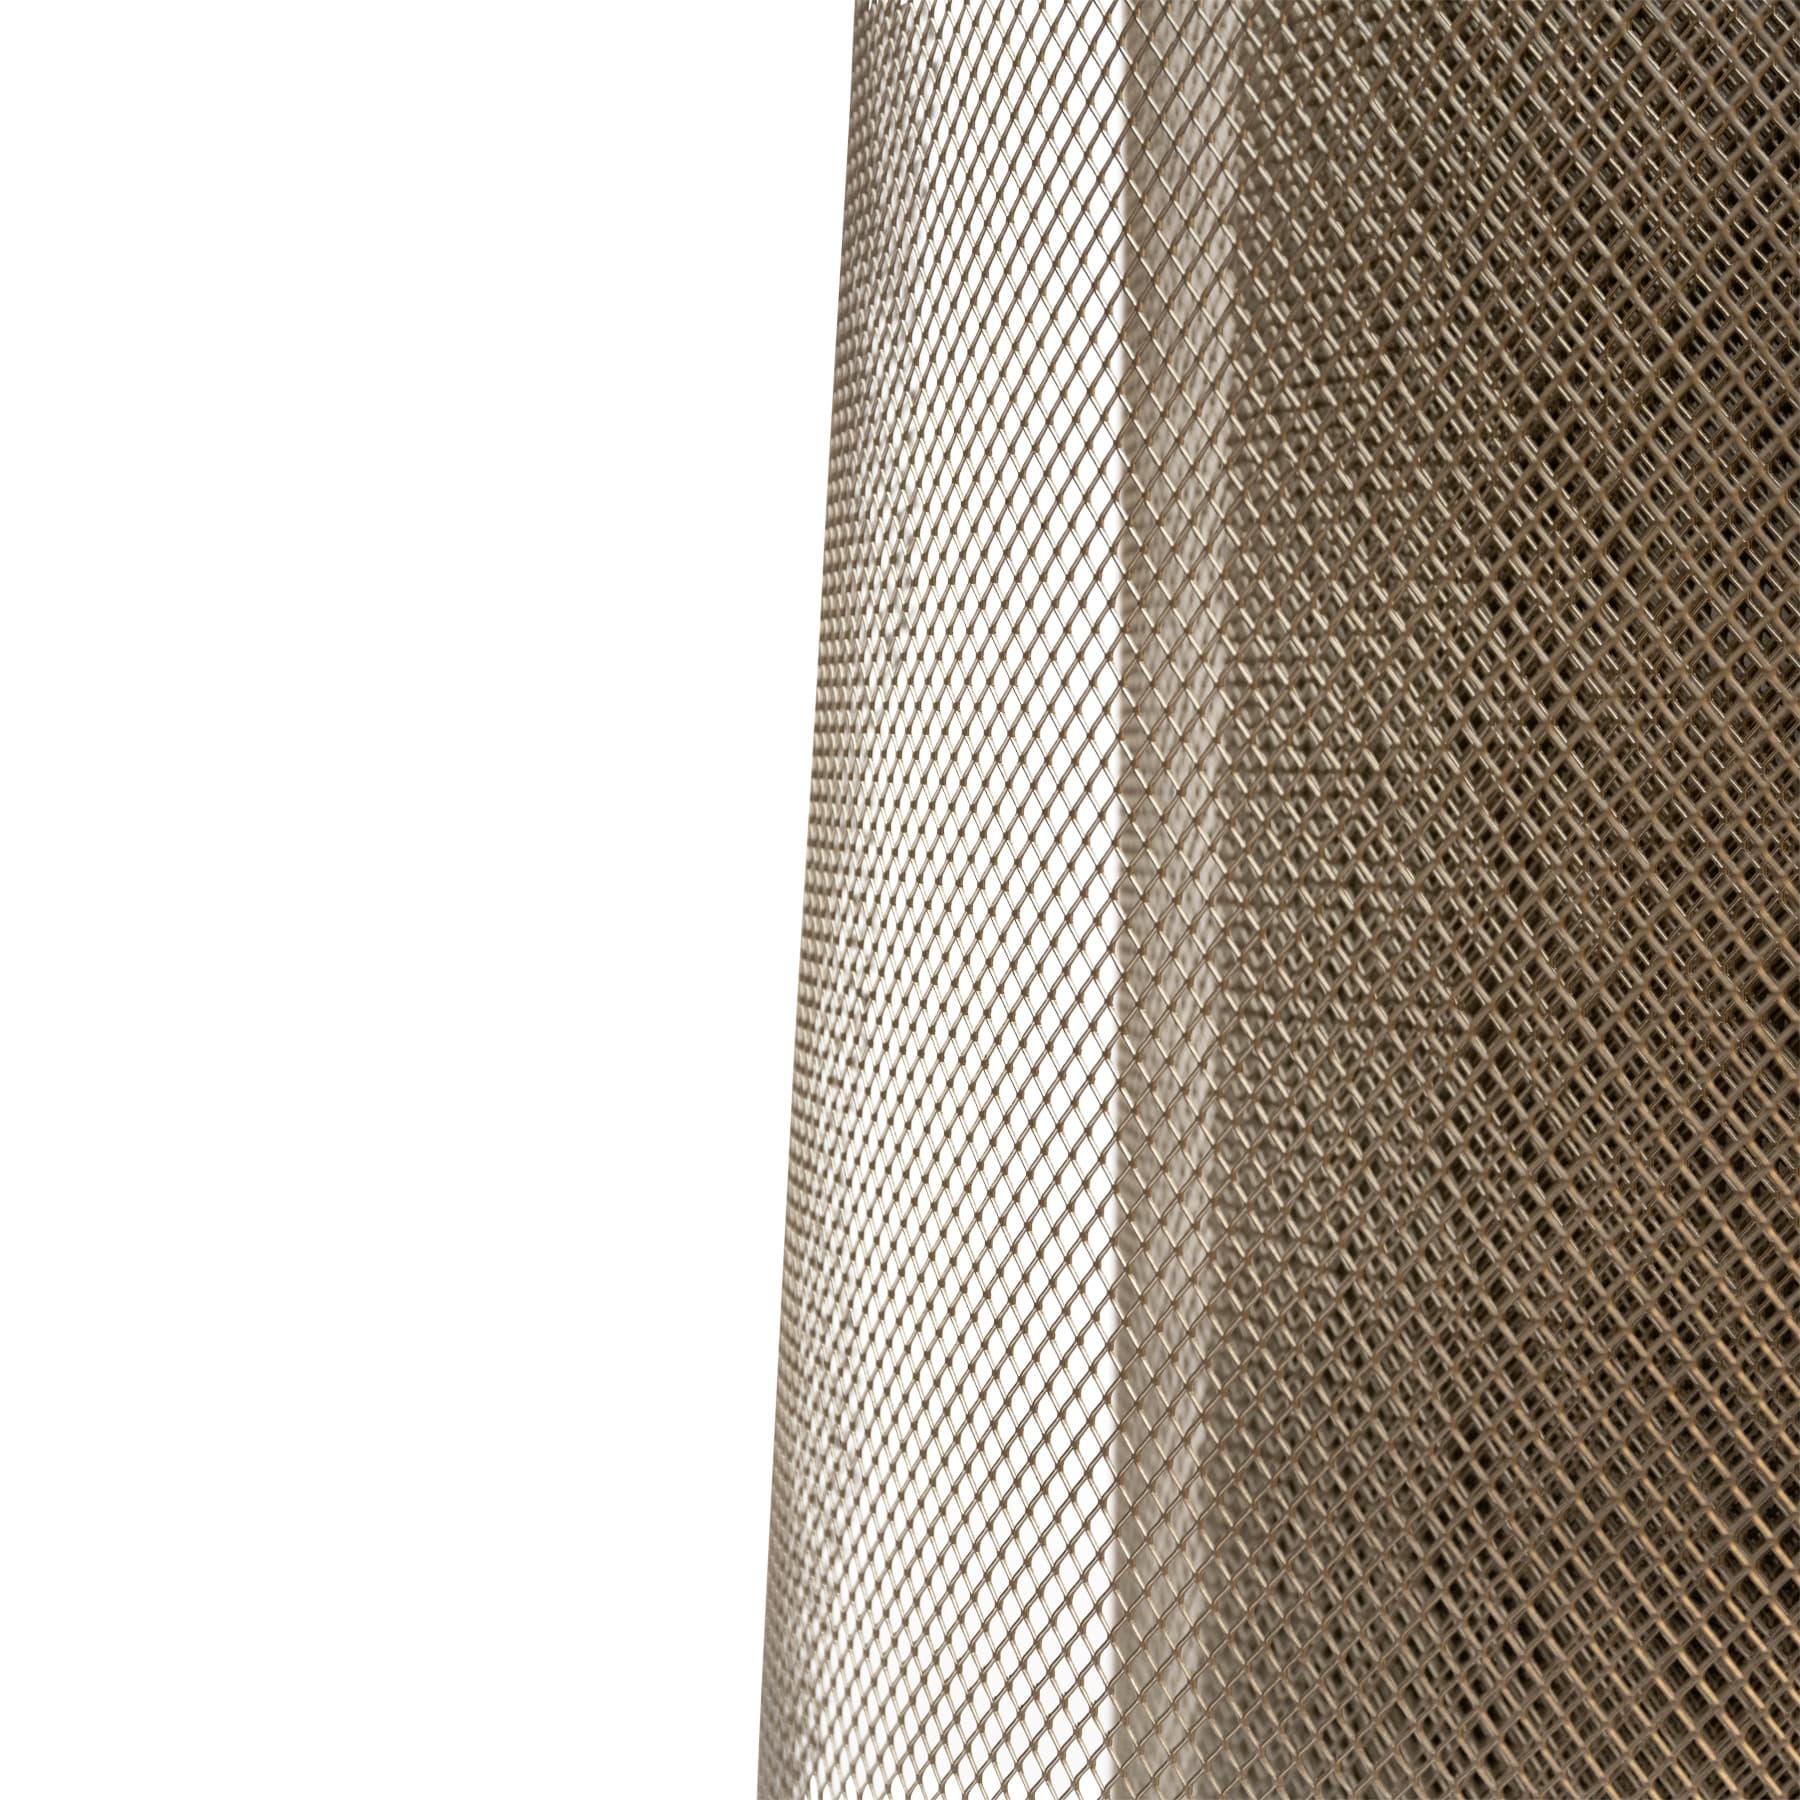 Edelstahlstreckgitter, bienendicht, Rollenware, 48,5 cm breit lfdm